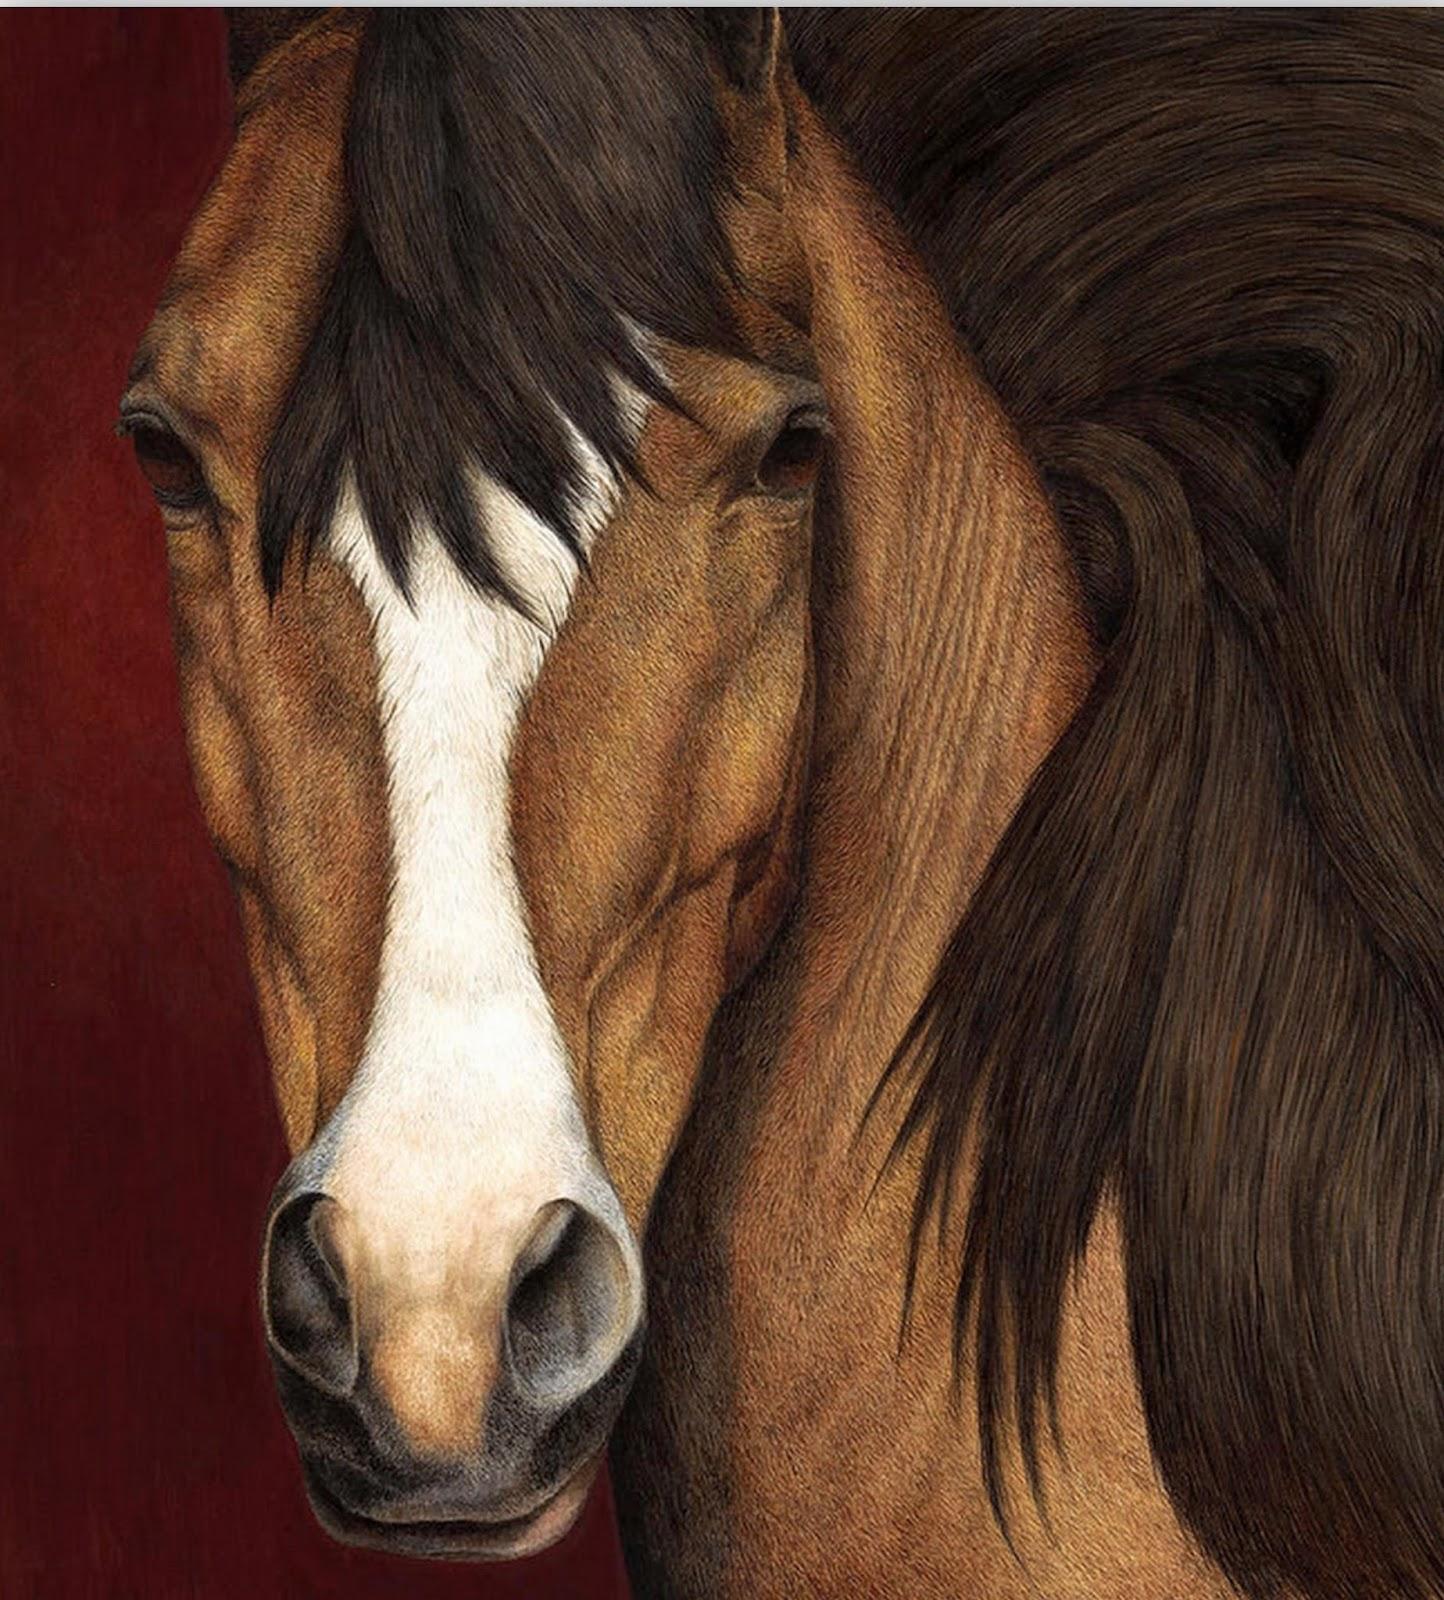 retratos-de-caballos-pintados-al-oleo